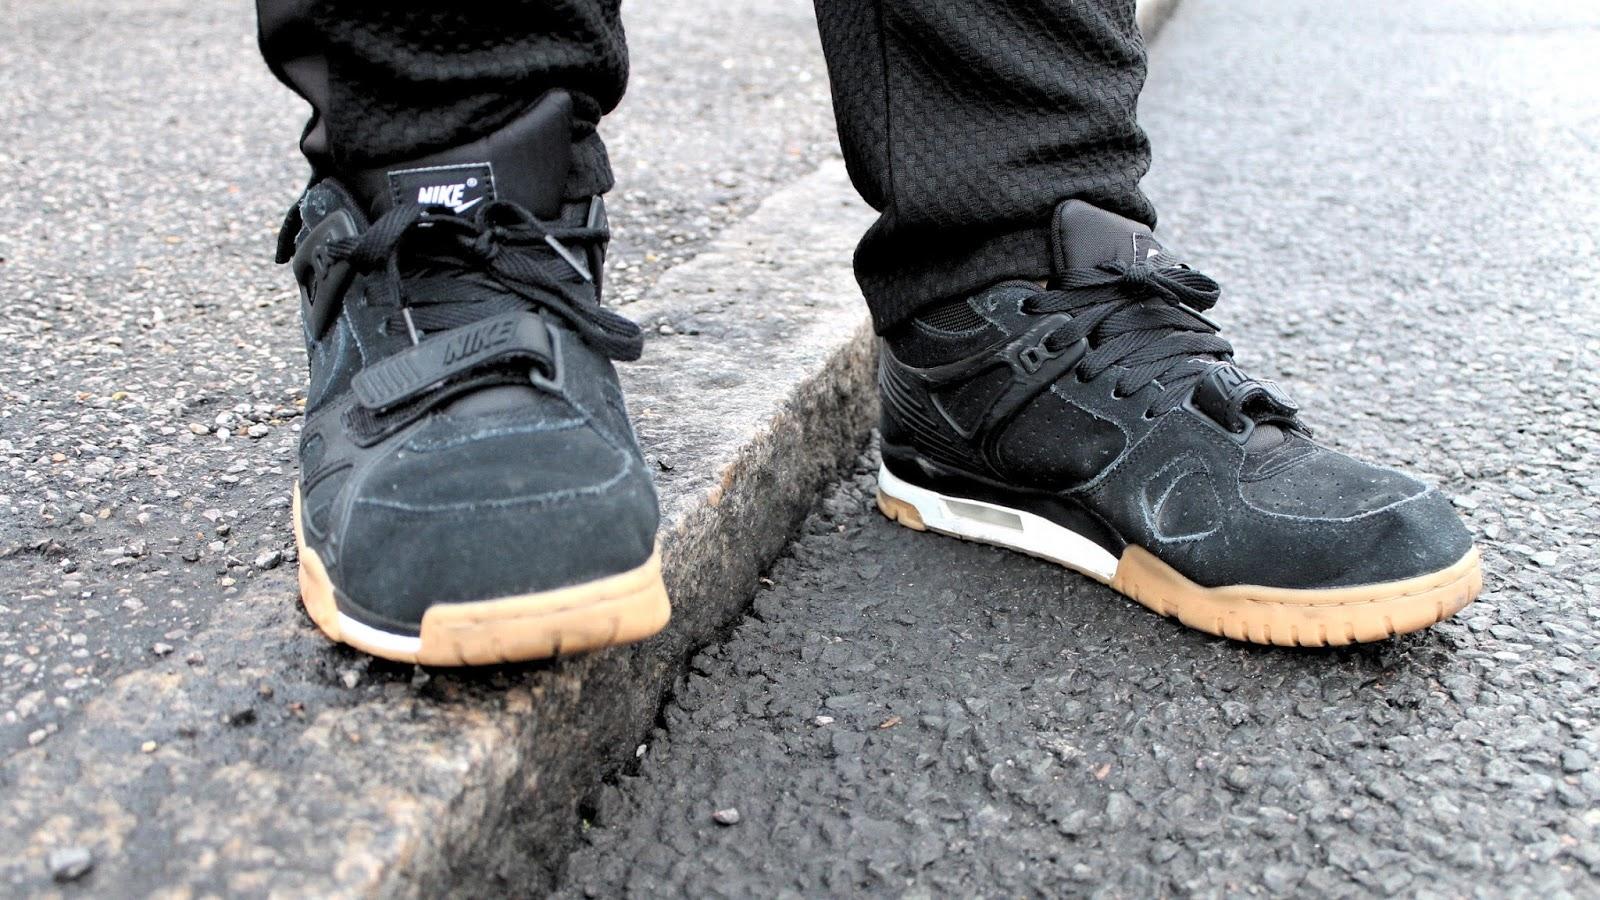 Nike Black & Camel Trainers